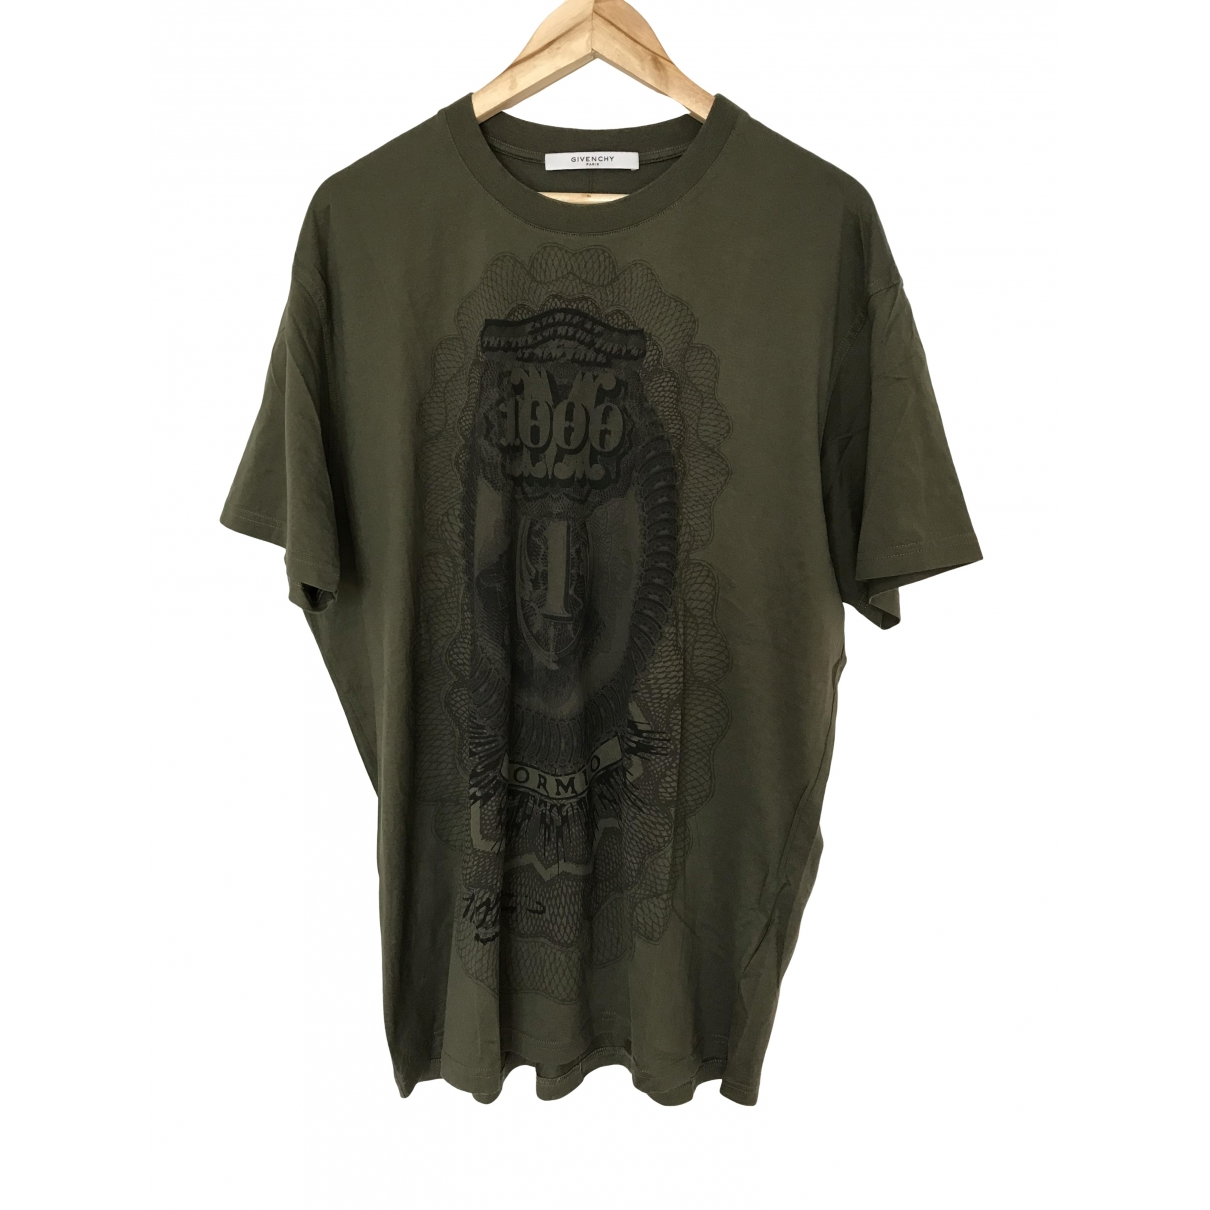 Givenchy \N Khaki Cotton T-shirts for Men L International